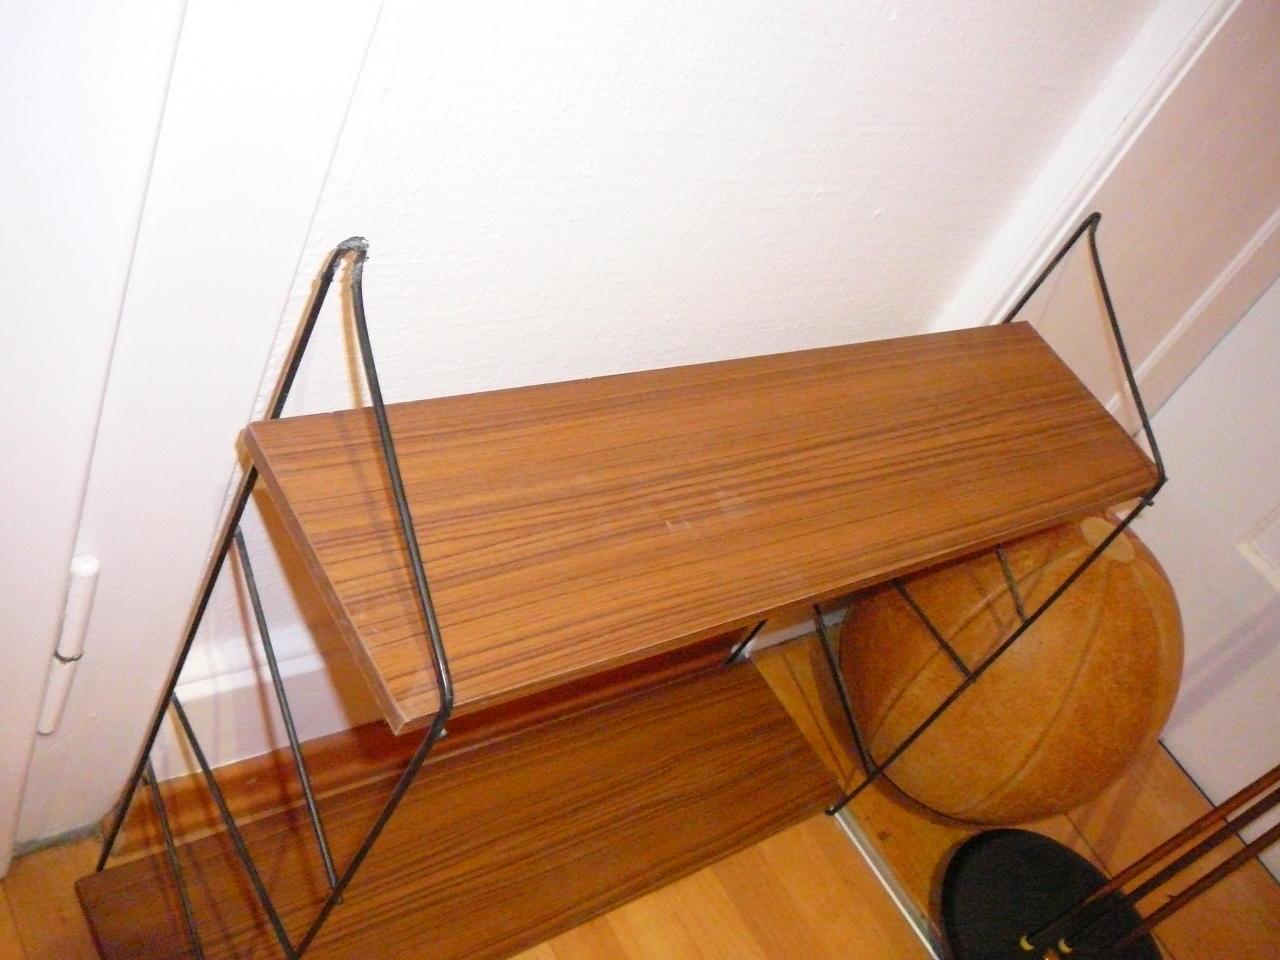 string regal gebraucht ruempelstilzchen 60er string regal system teakholz vintage string regal. Black Bedroom Furniture Sets. Home Design Ideas